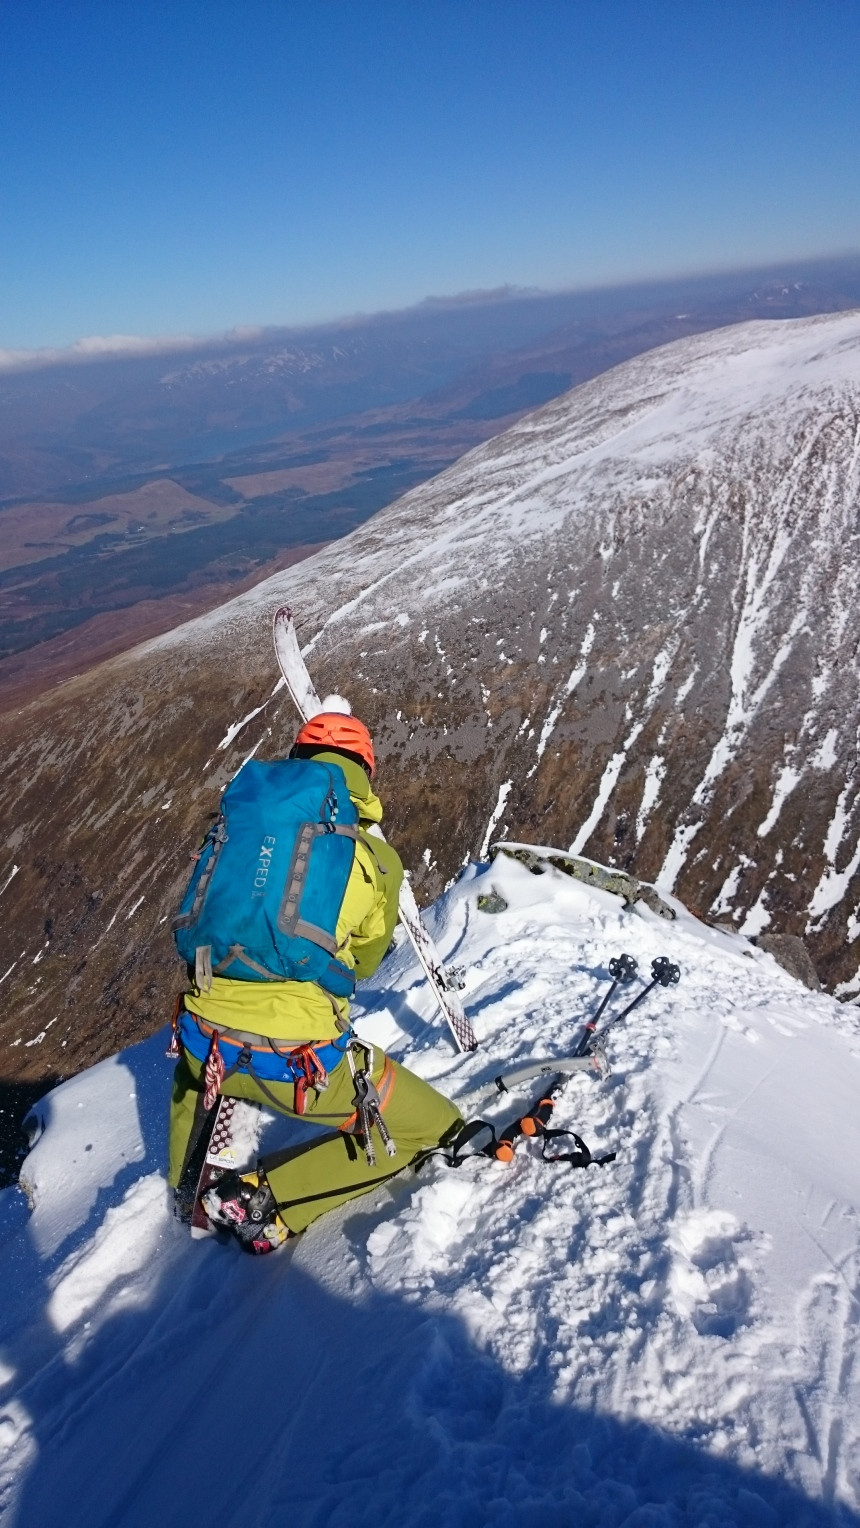 Ski descent anyone?